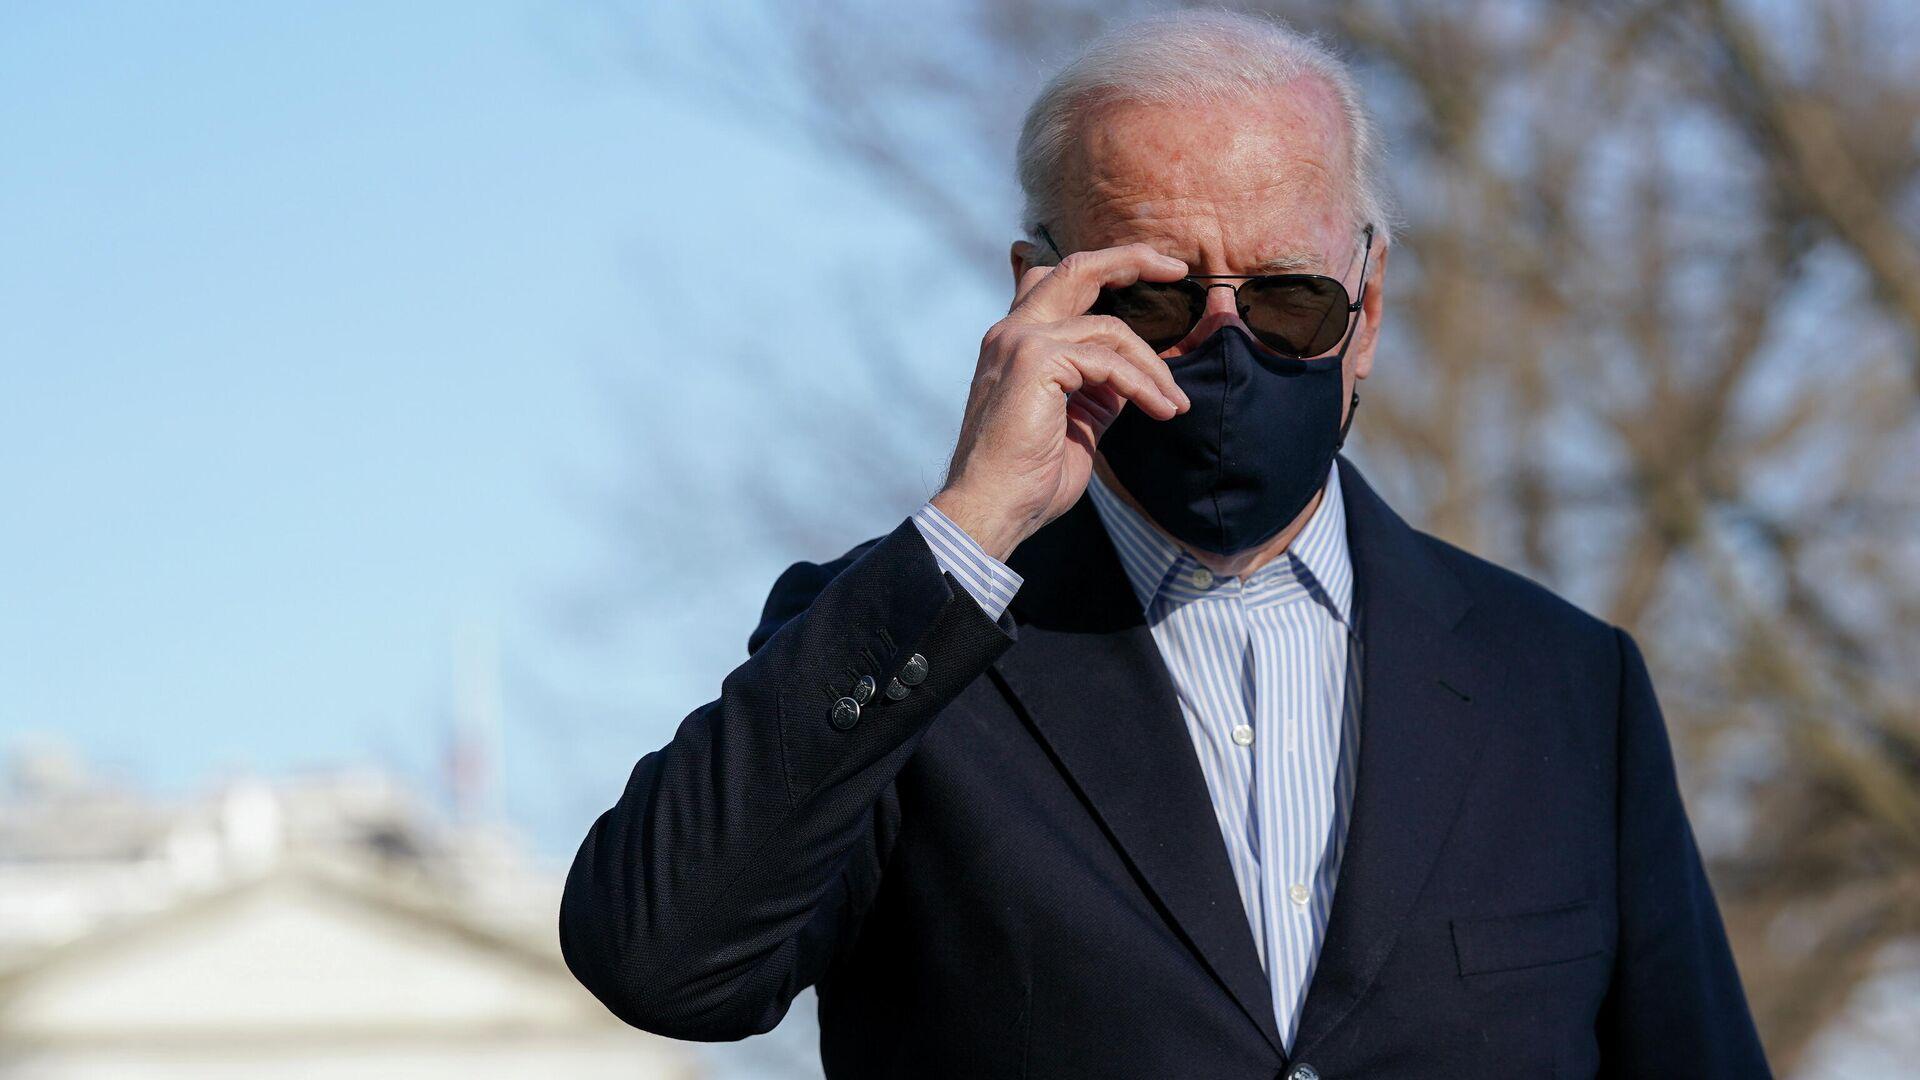 Joe Biden, presidente de EEUU - Sputnik Mundo, 1920, 22.03.2021